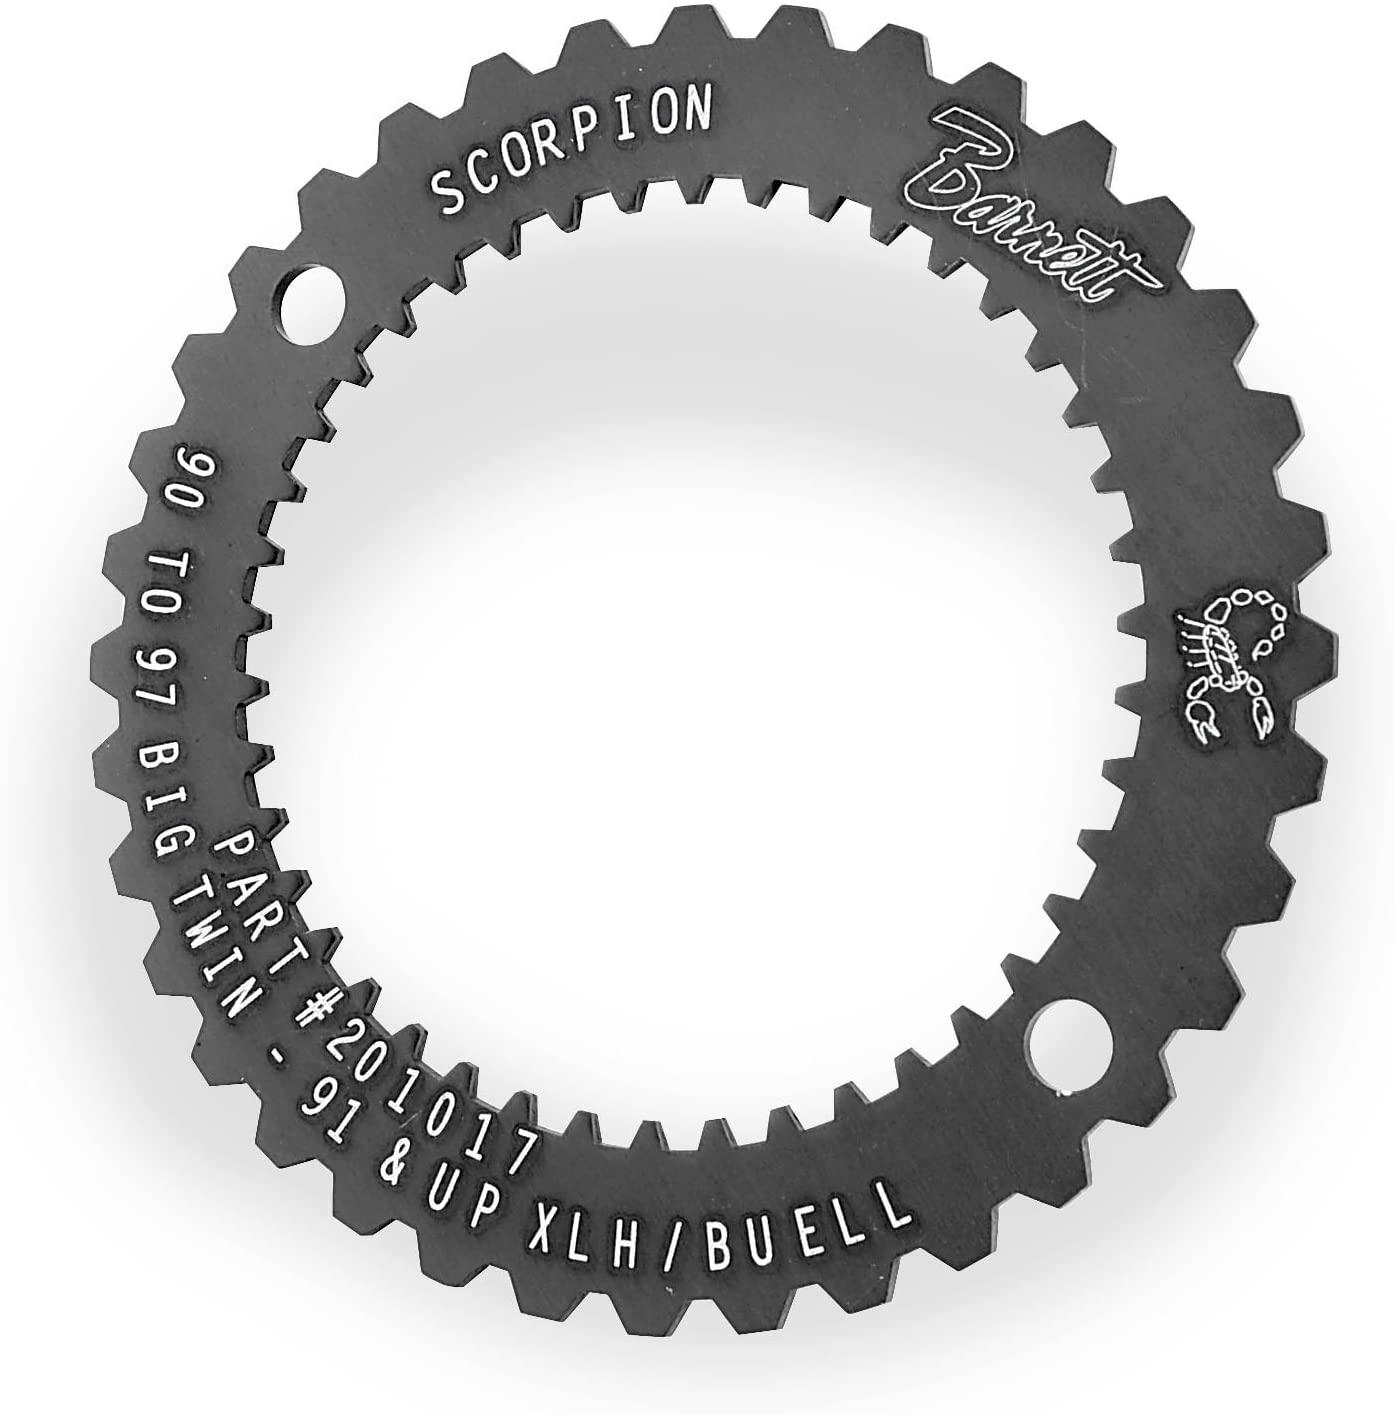 Barnett Performance Products Scorpion Clutch Lock Plate